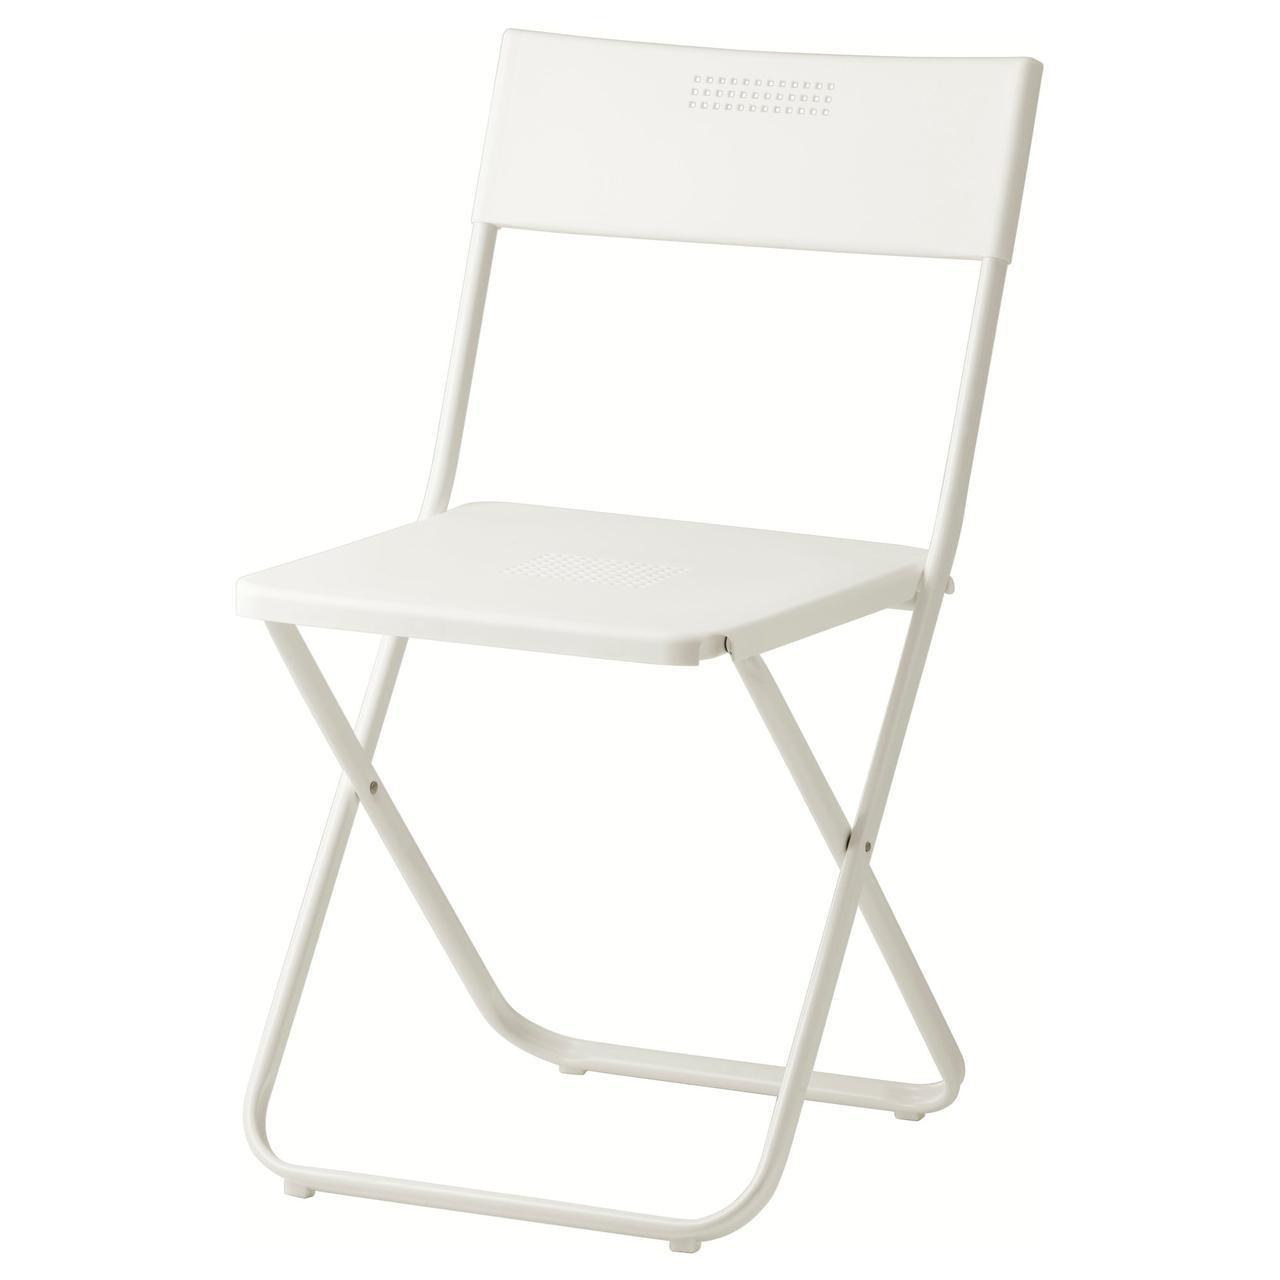 IKEA FEJAN (102.553.07) Стул, сад, белый сложенный белый